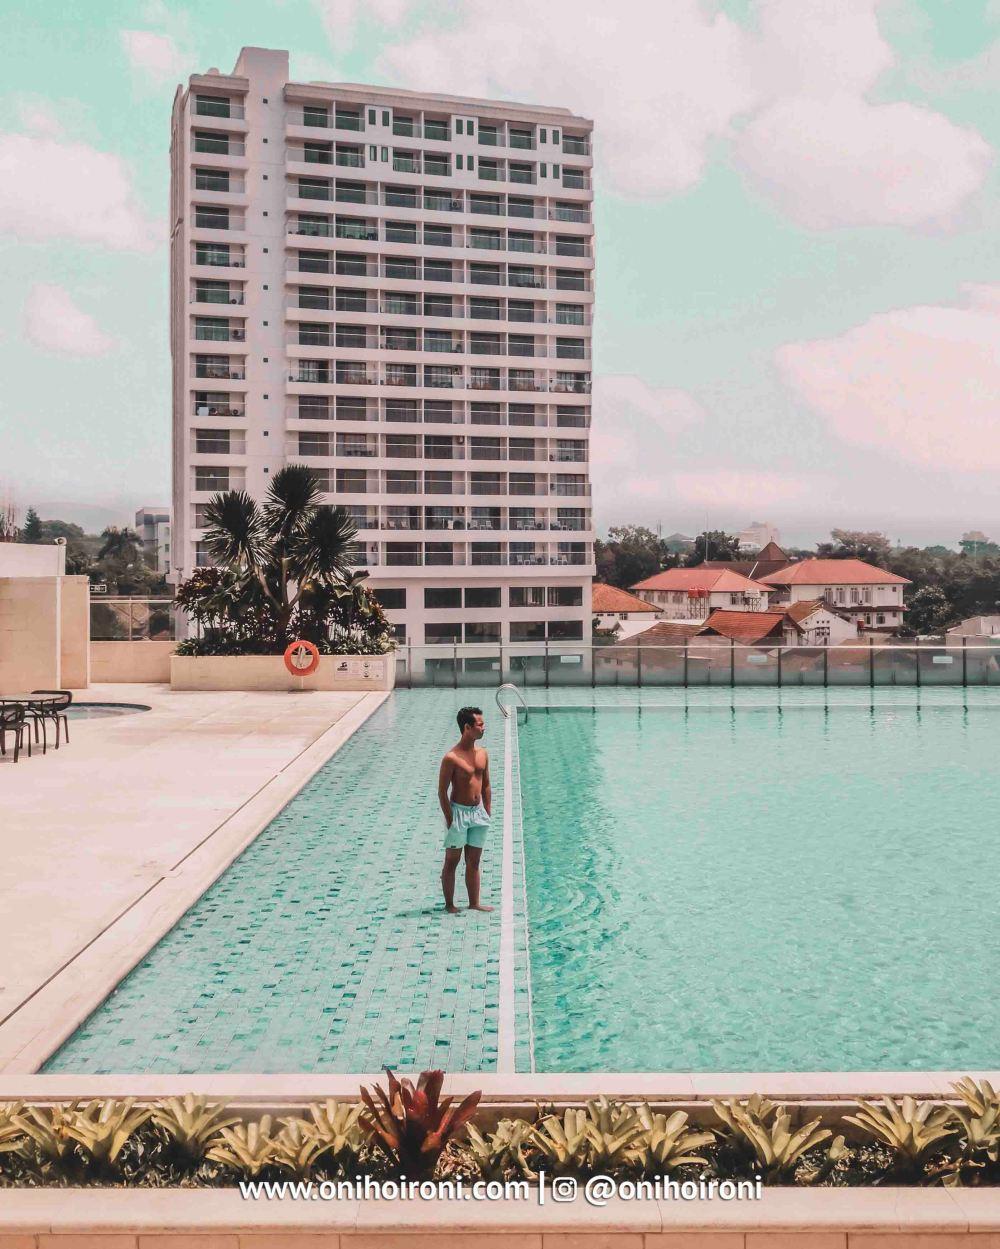 5 Swimming Pool Crowne Plaza Bandung Oni Hoironi